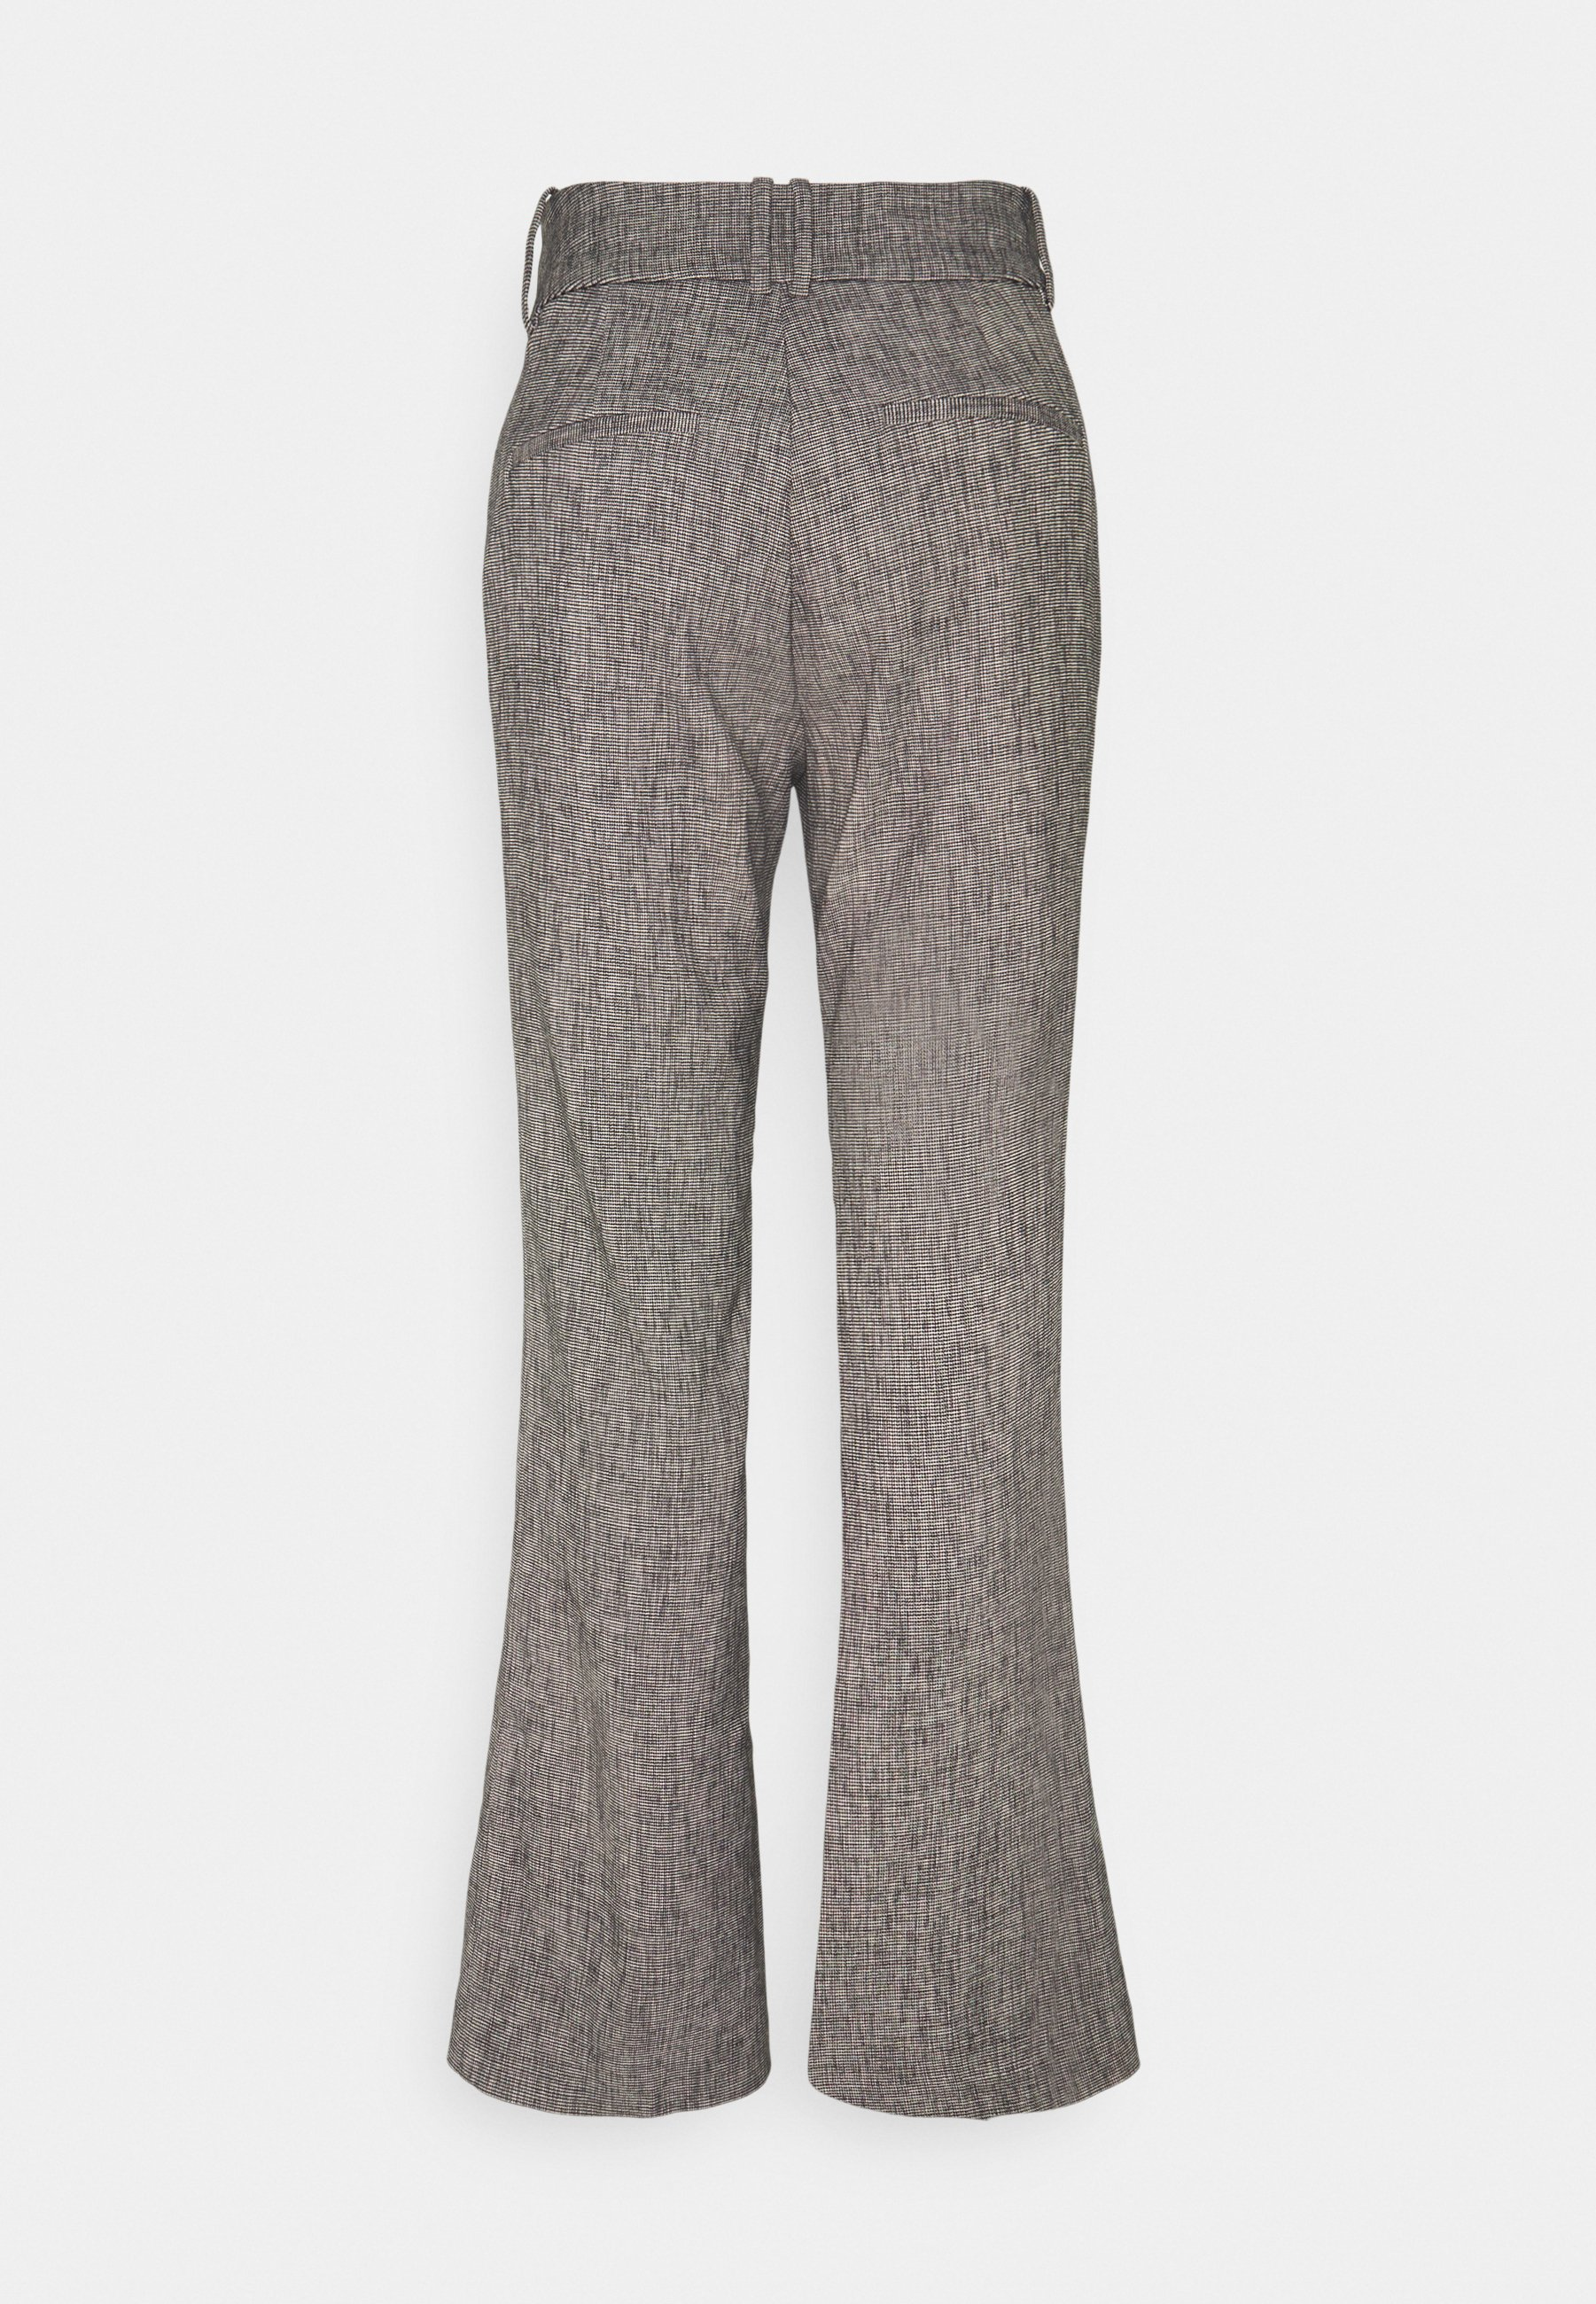 Inwear Verdii Bootcut Pant - Bukse Black / White/svart